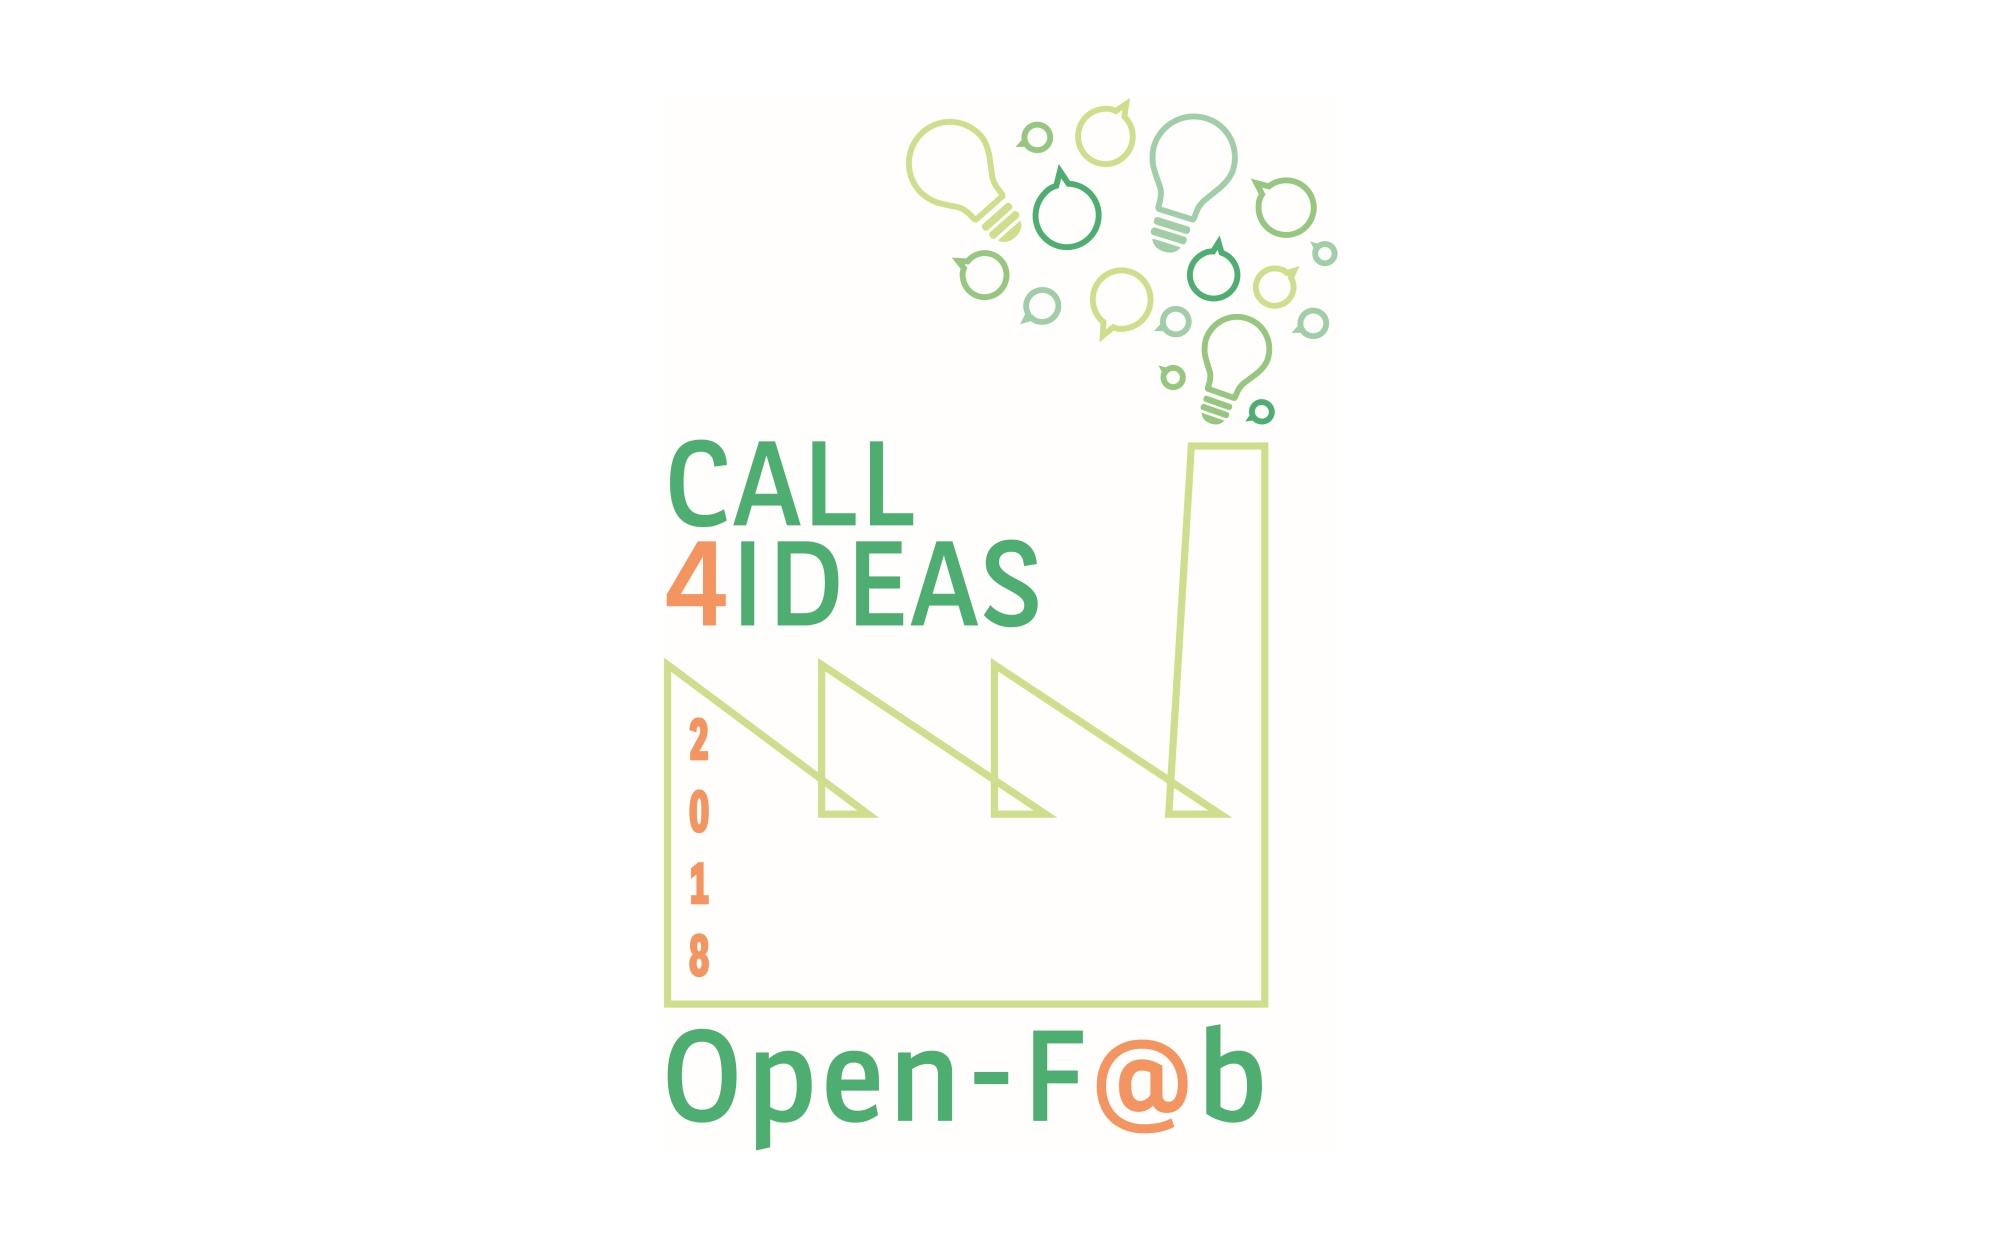 Open-F@b Call4Ideas 2018